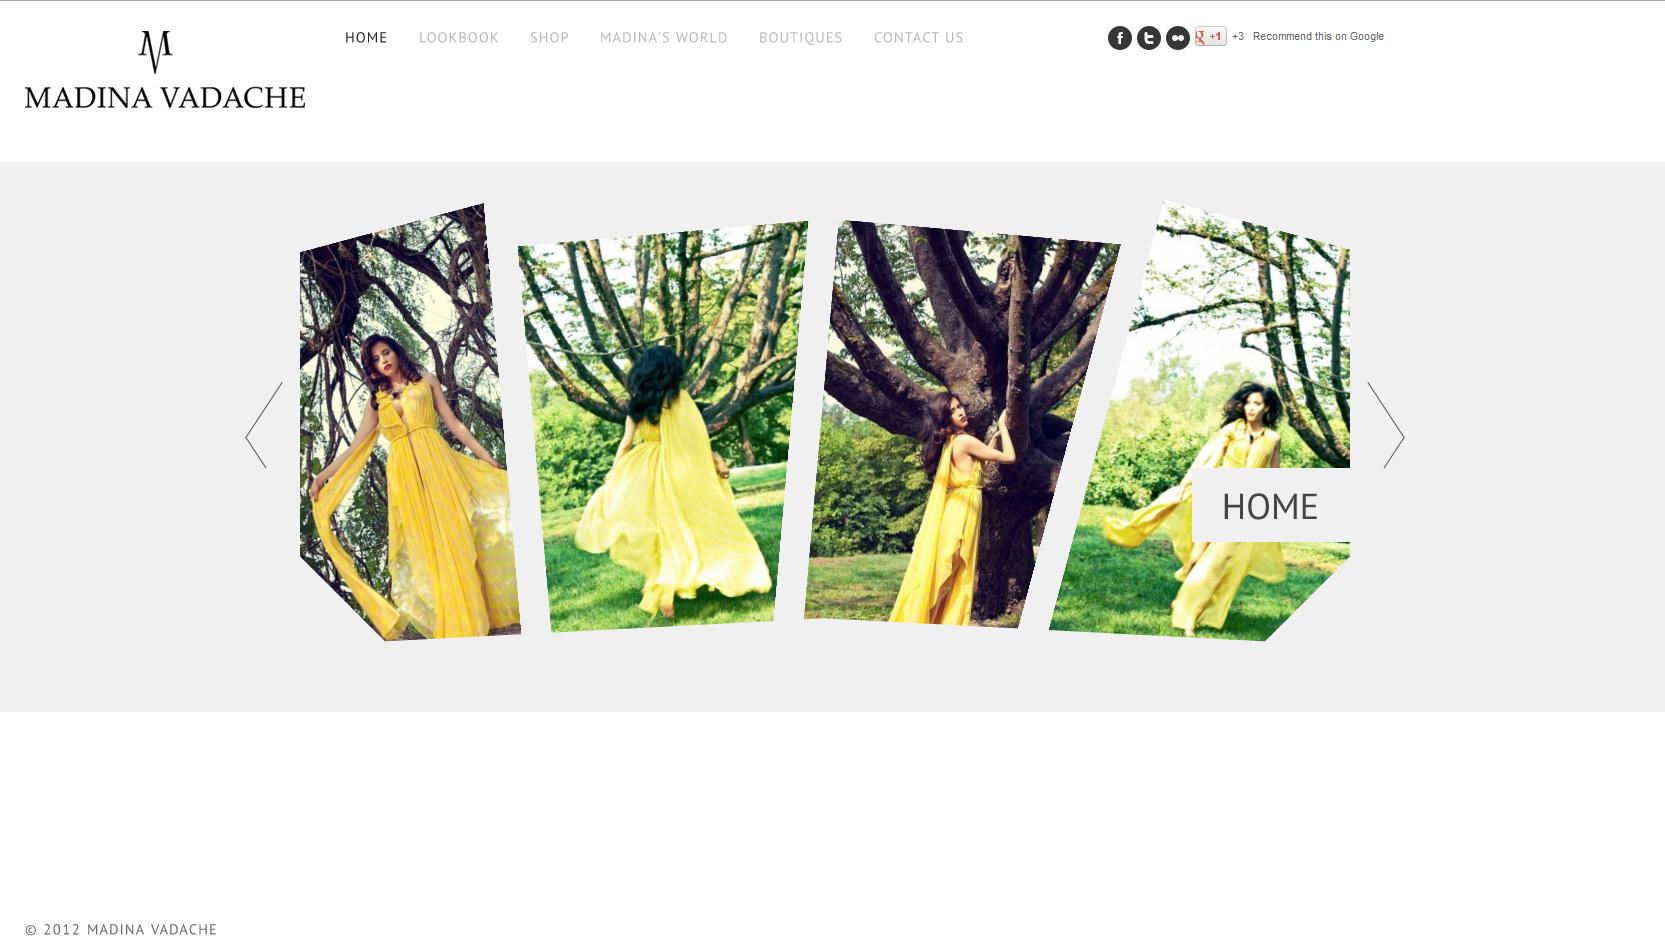 Designer: Madina Vadache <br />Photography: Roman Levitskiy <br />Hair &amp; MakeUp: Rosaline Hampton <br />http://www.madinavadache.com/ <br />